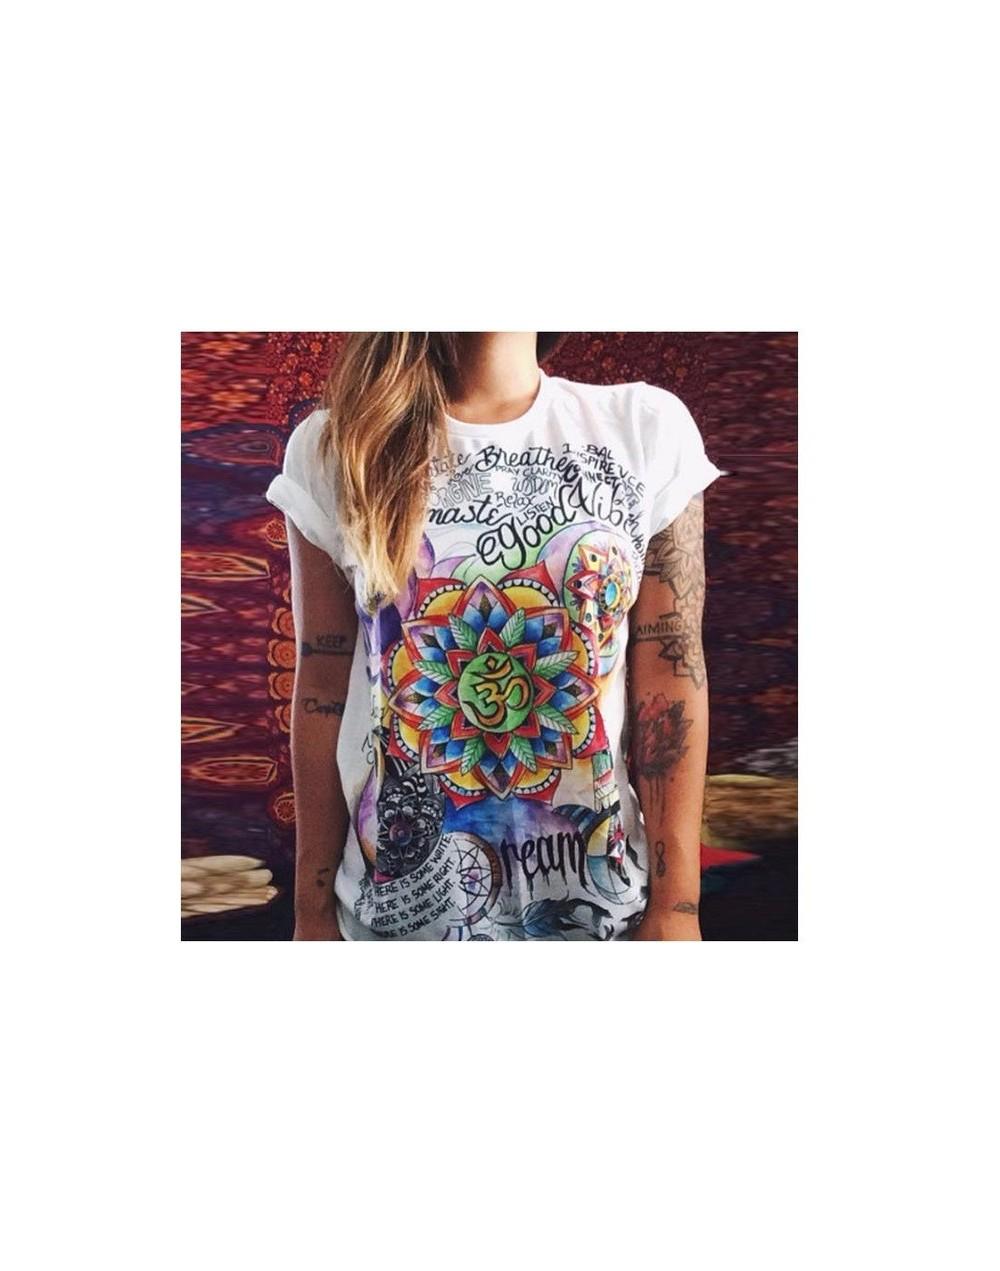 Women T Shirt 2019 Short Sleeve Round collar Sleeve head Chiffon shirt Wild Print Chiffon Female Tees Women Top - style3 - 4...